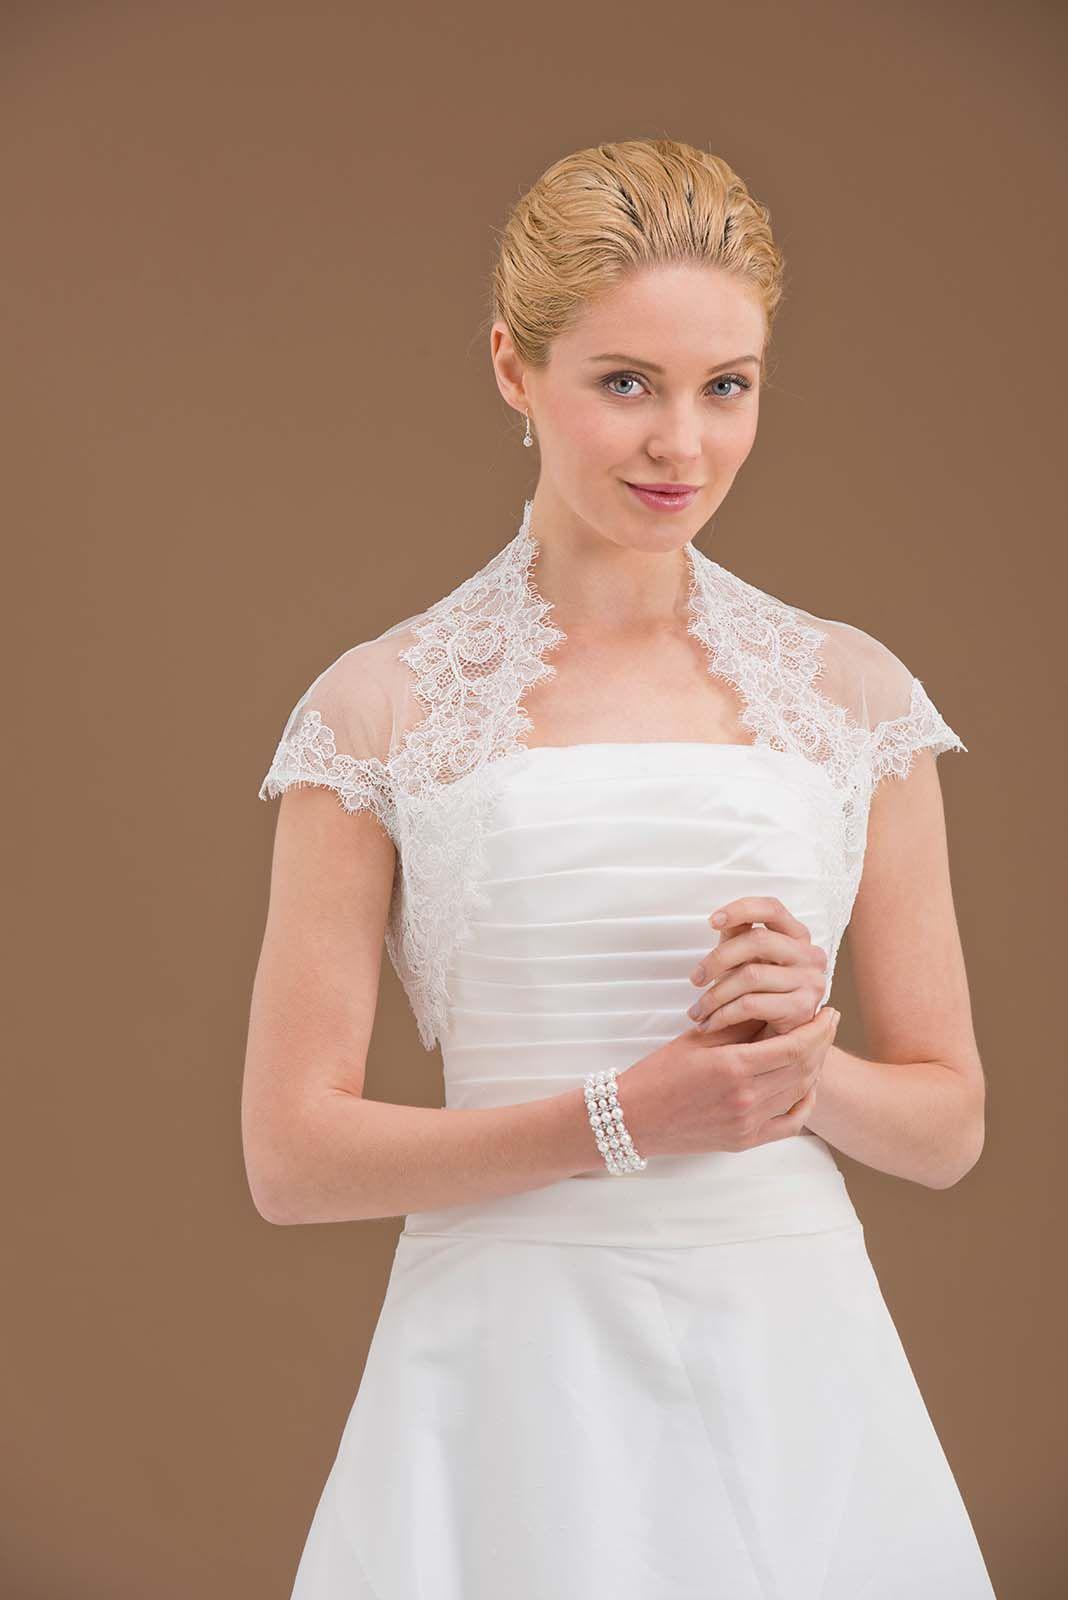 on sale 98b48 6037f EC09 (Eglantine Créations) #matrimonio #nozze #sposi #sposa ...